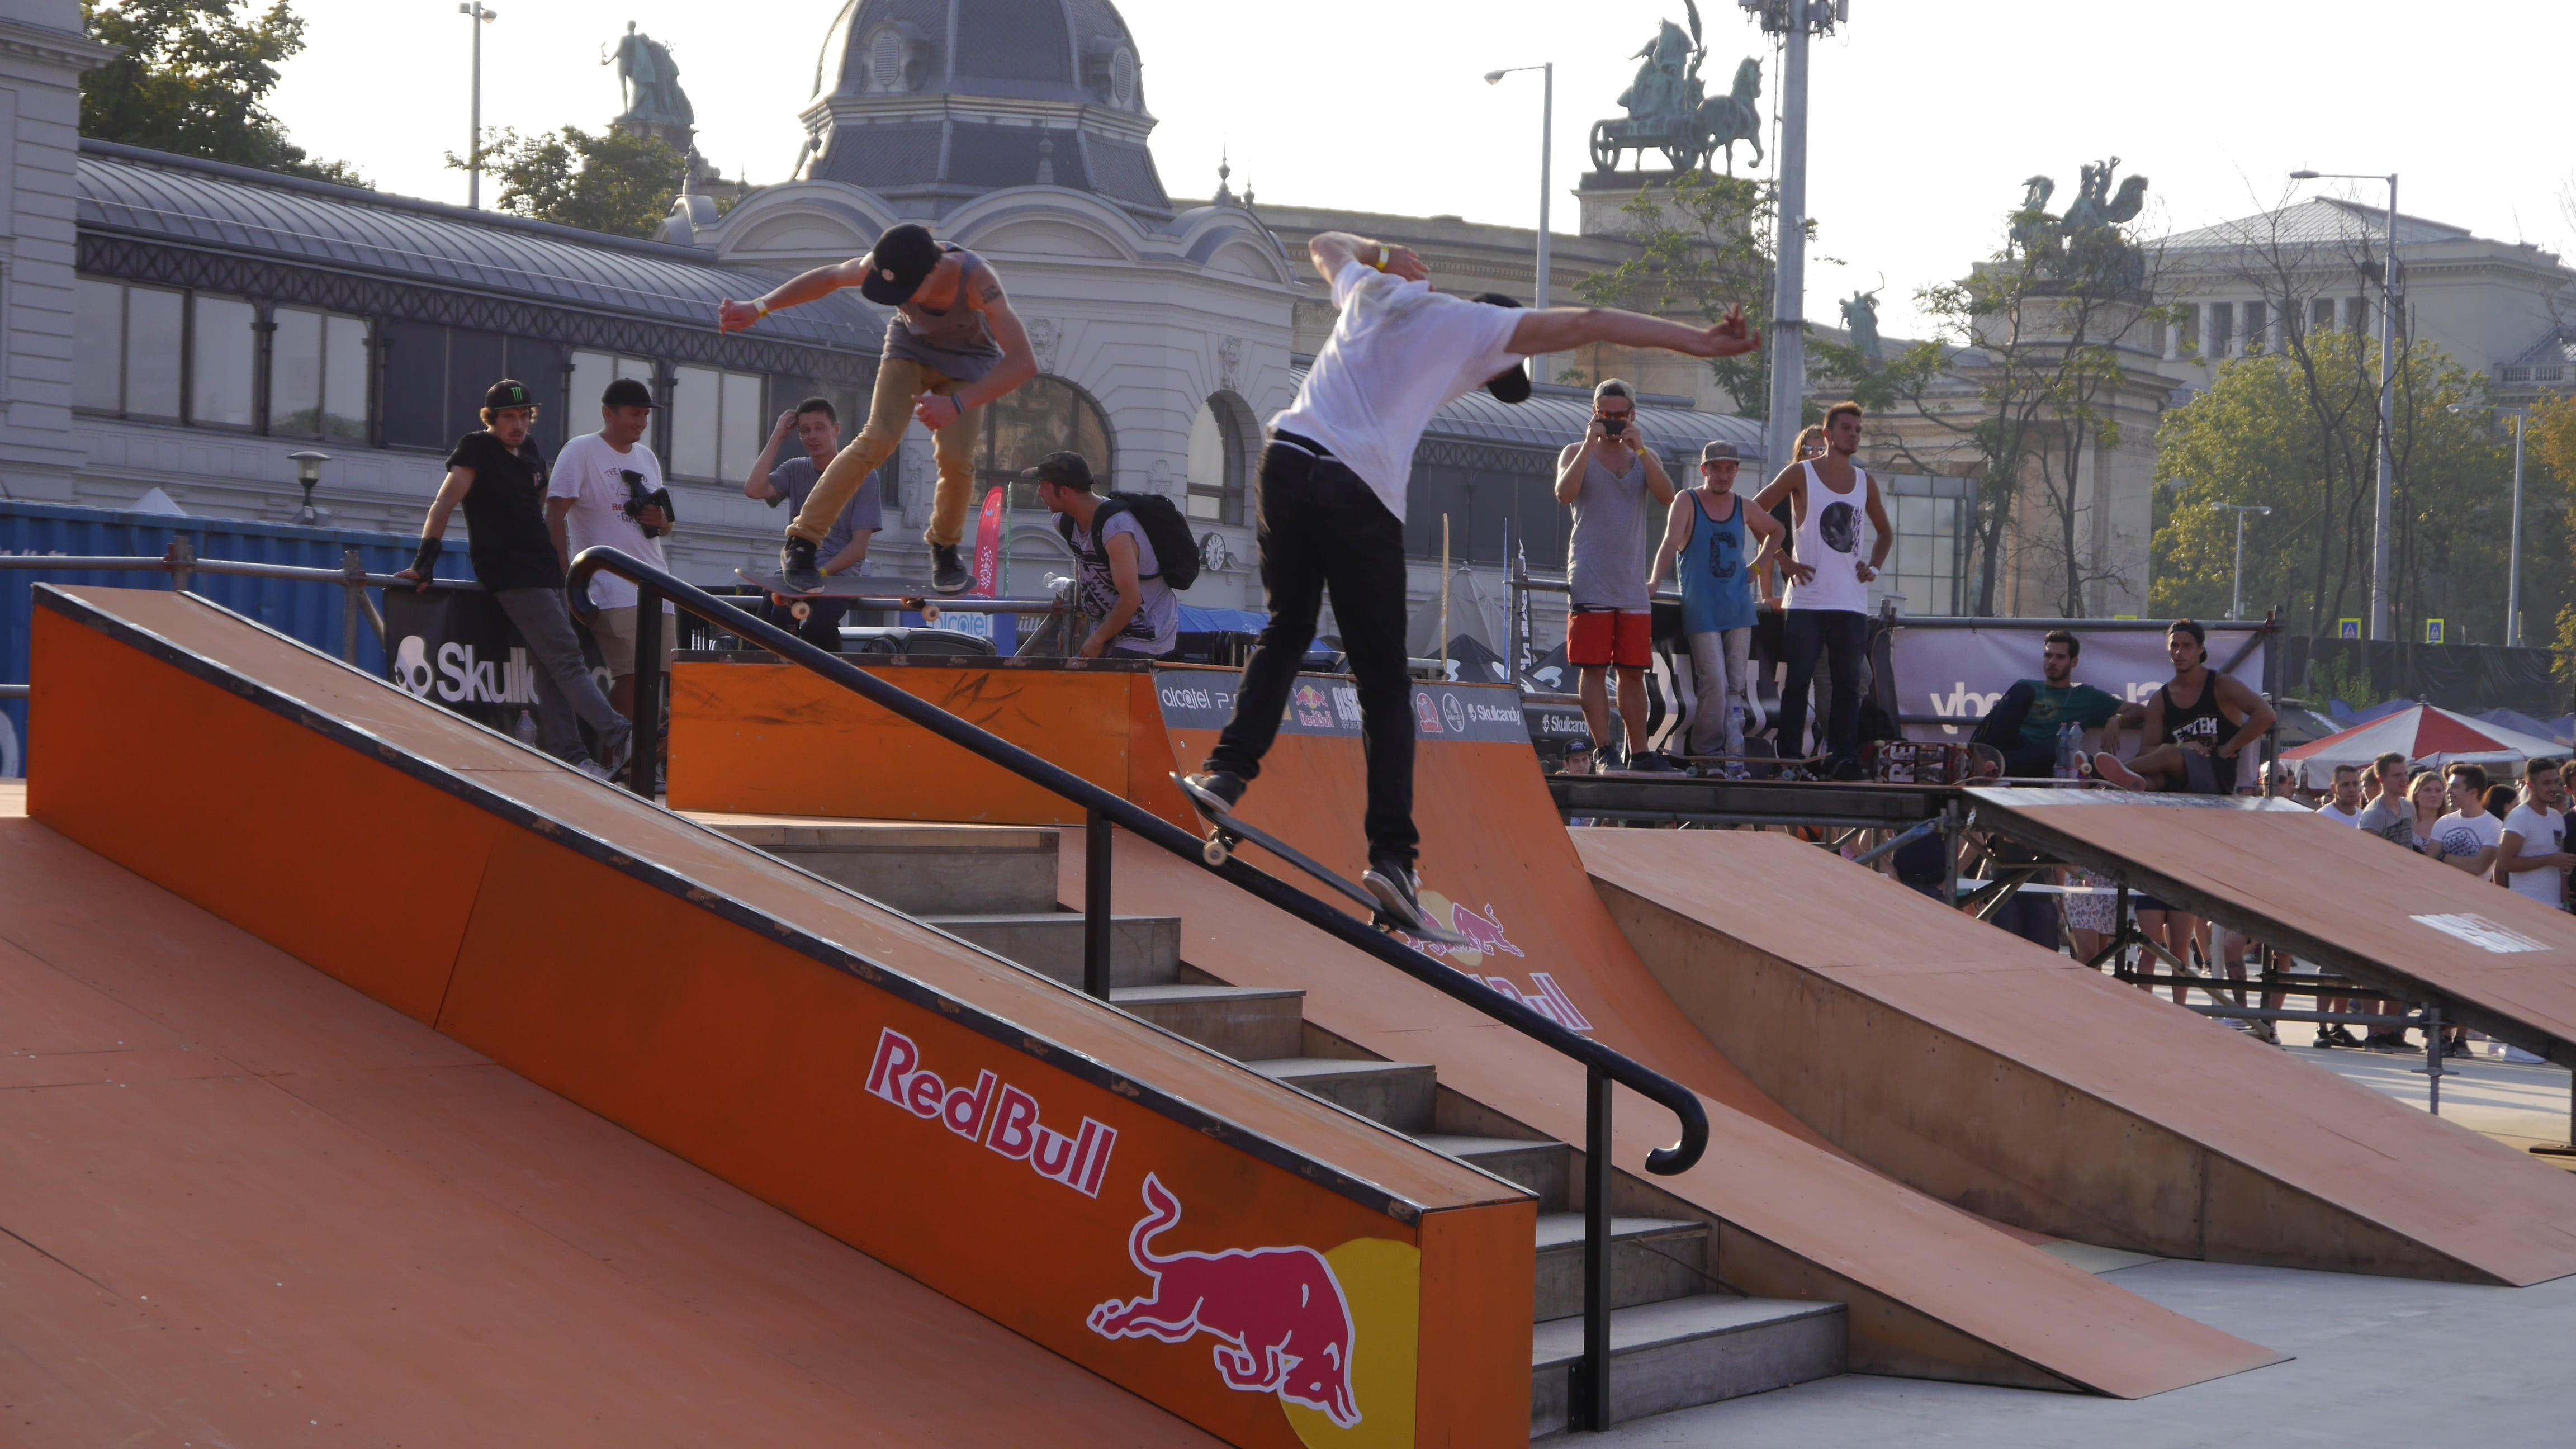 Free stock photo of osg17, skateboard